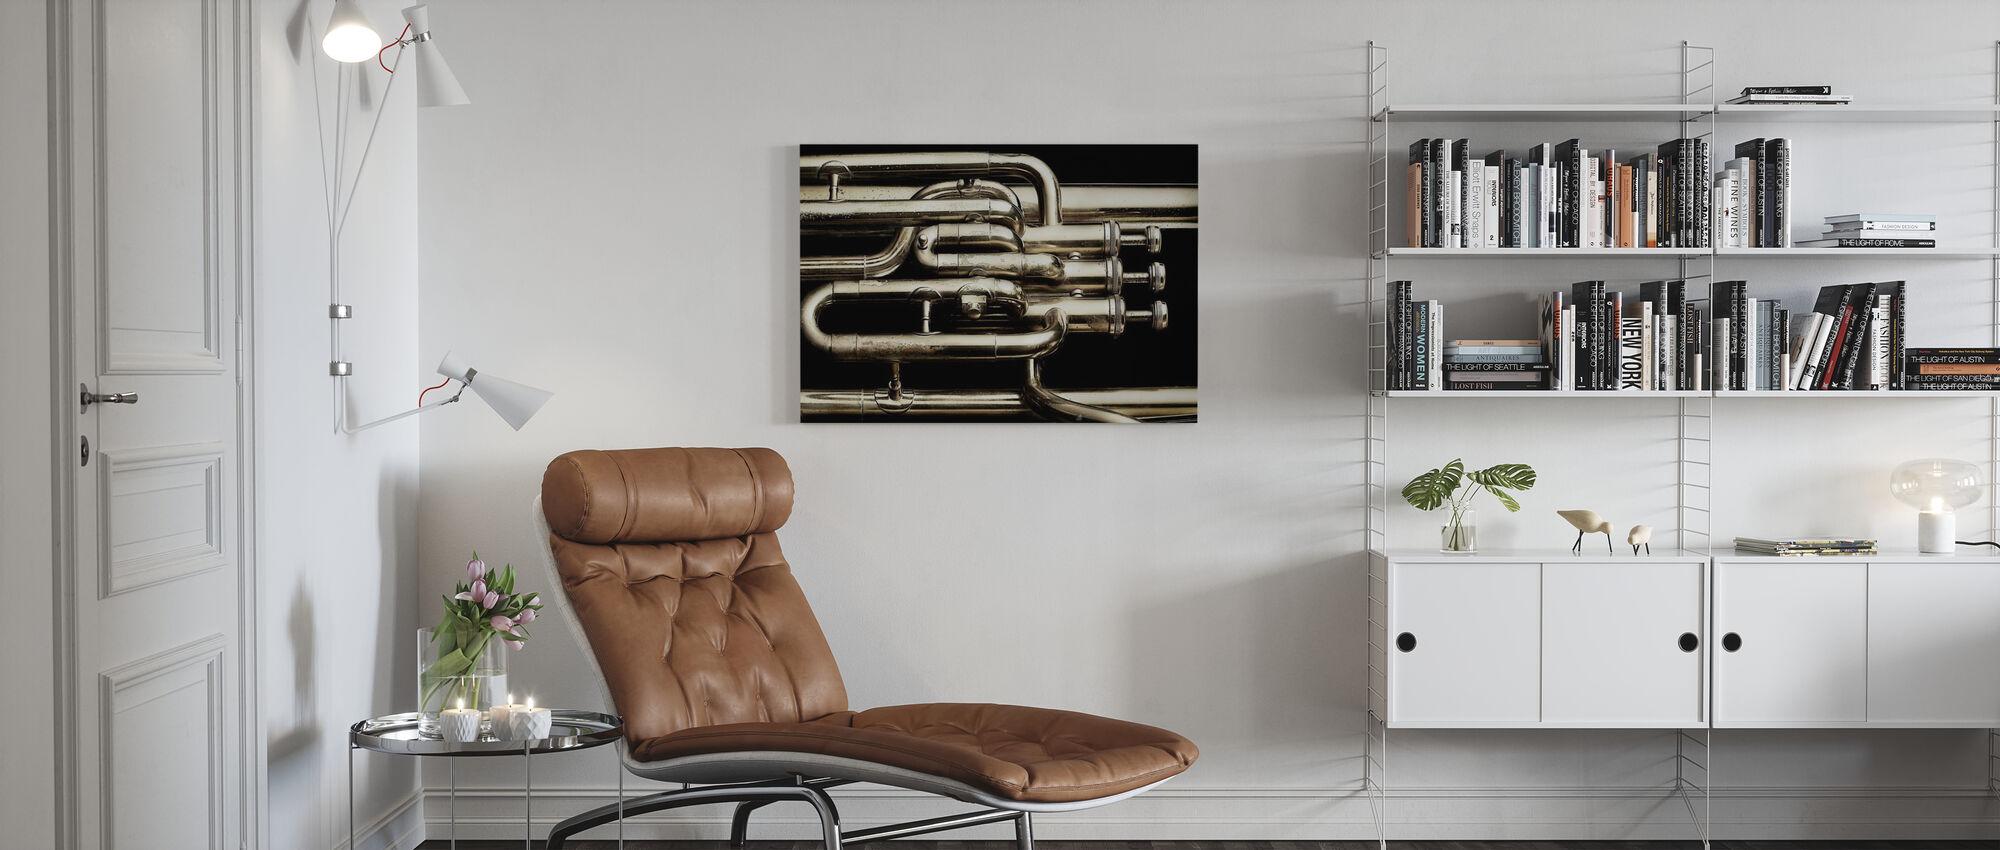 Brass Horn - Canvas print - Living Room